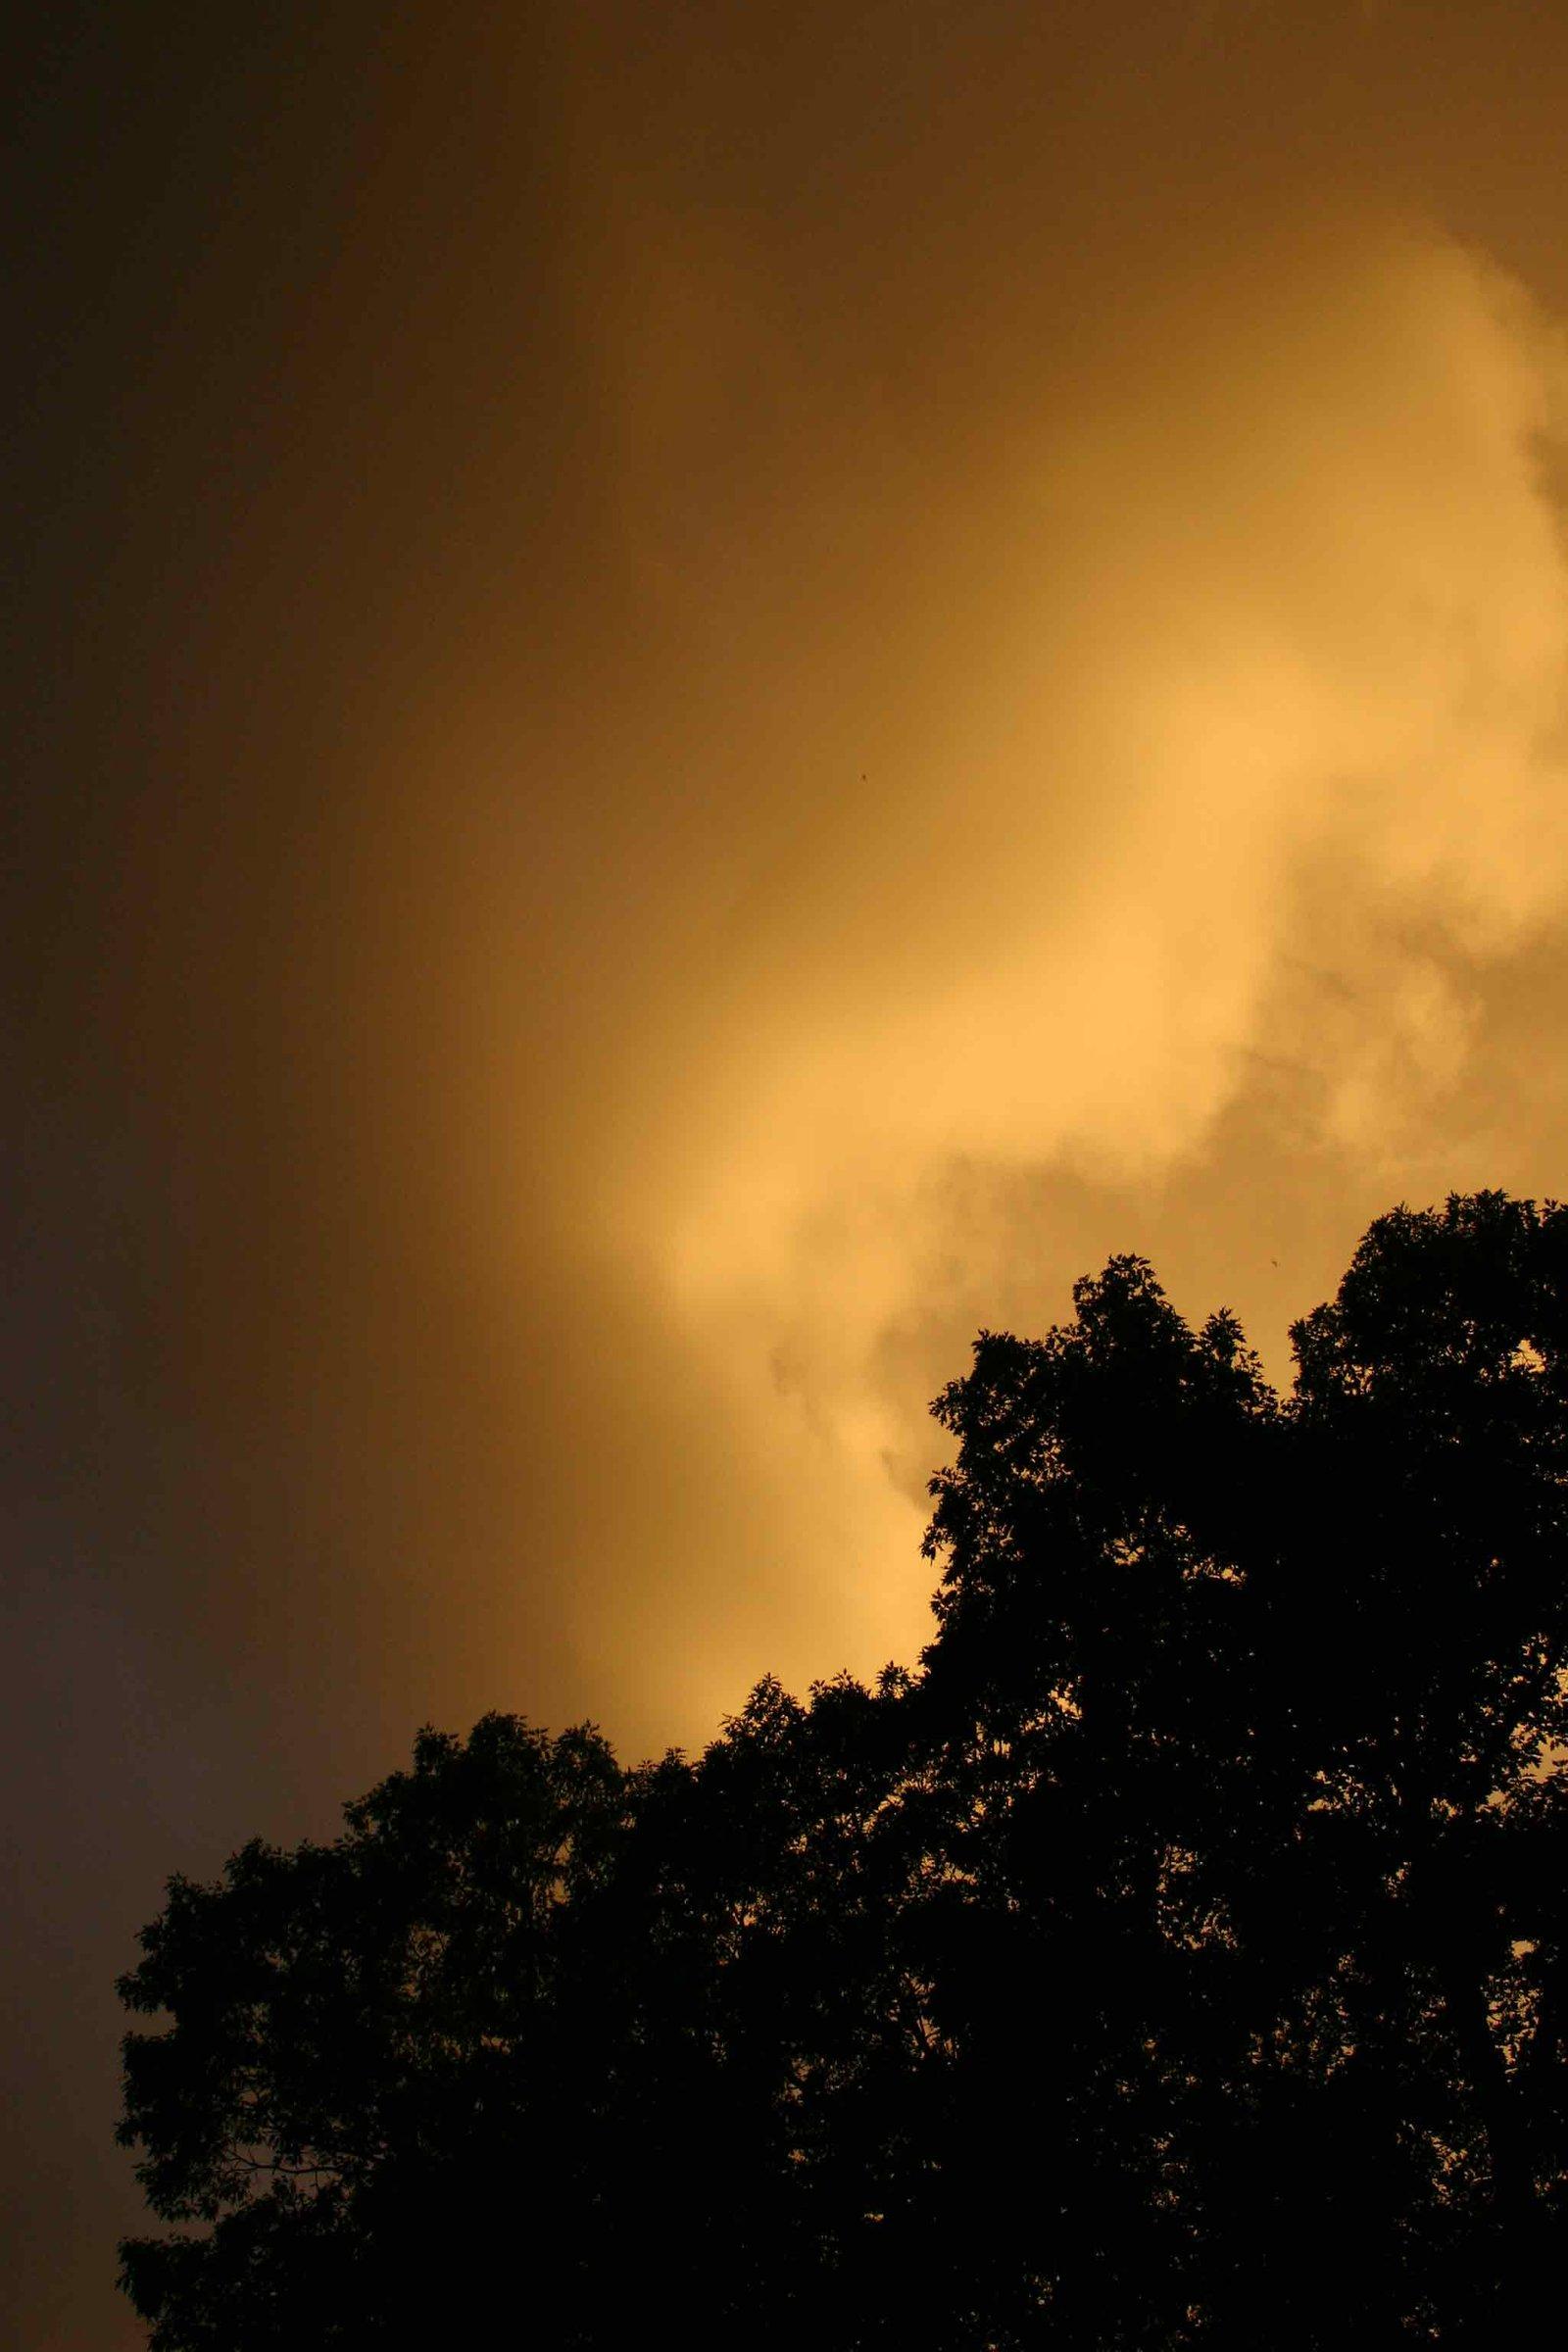 dark lighting in the sky during sunset